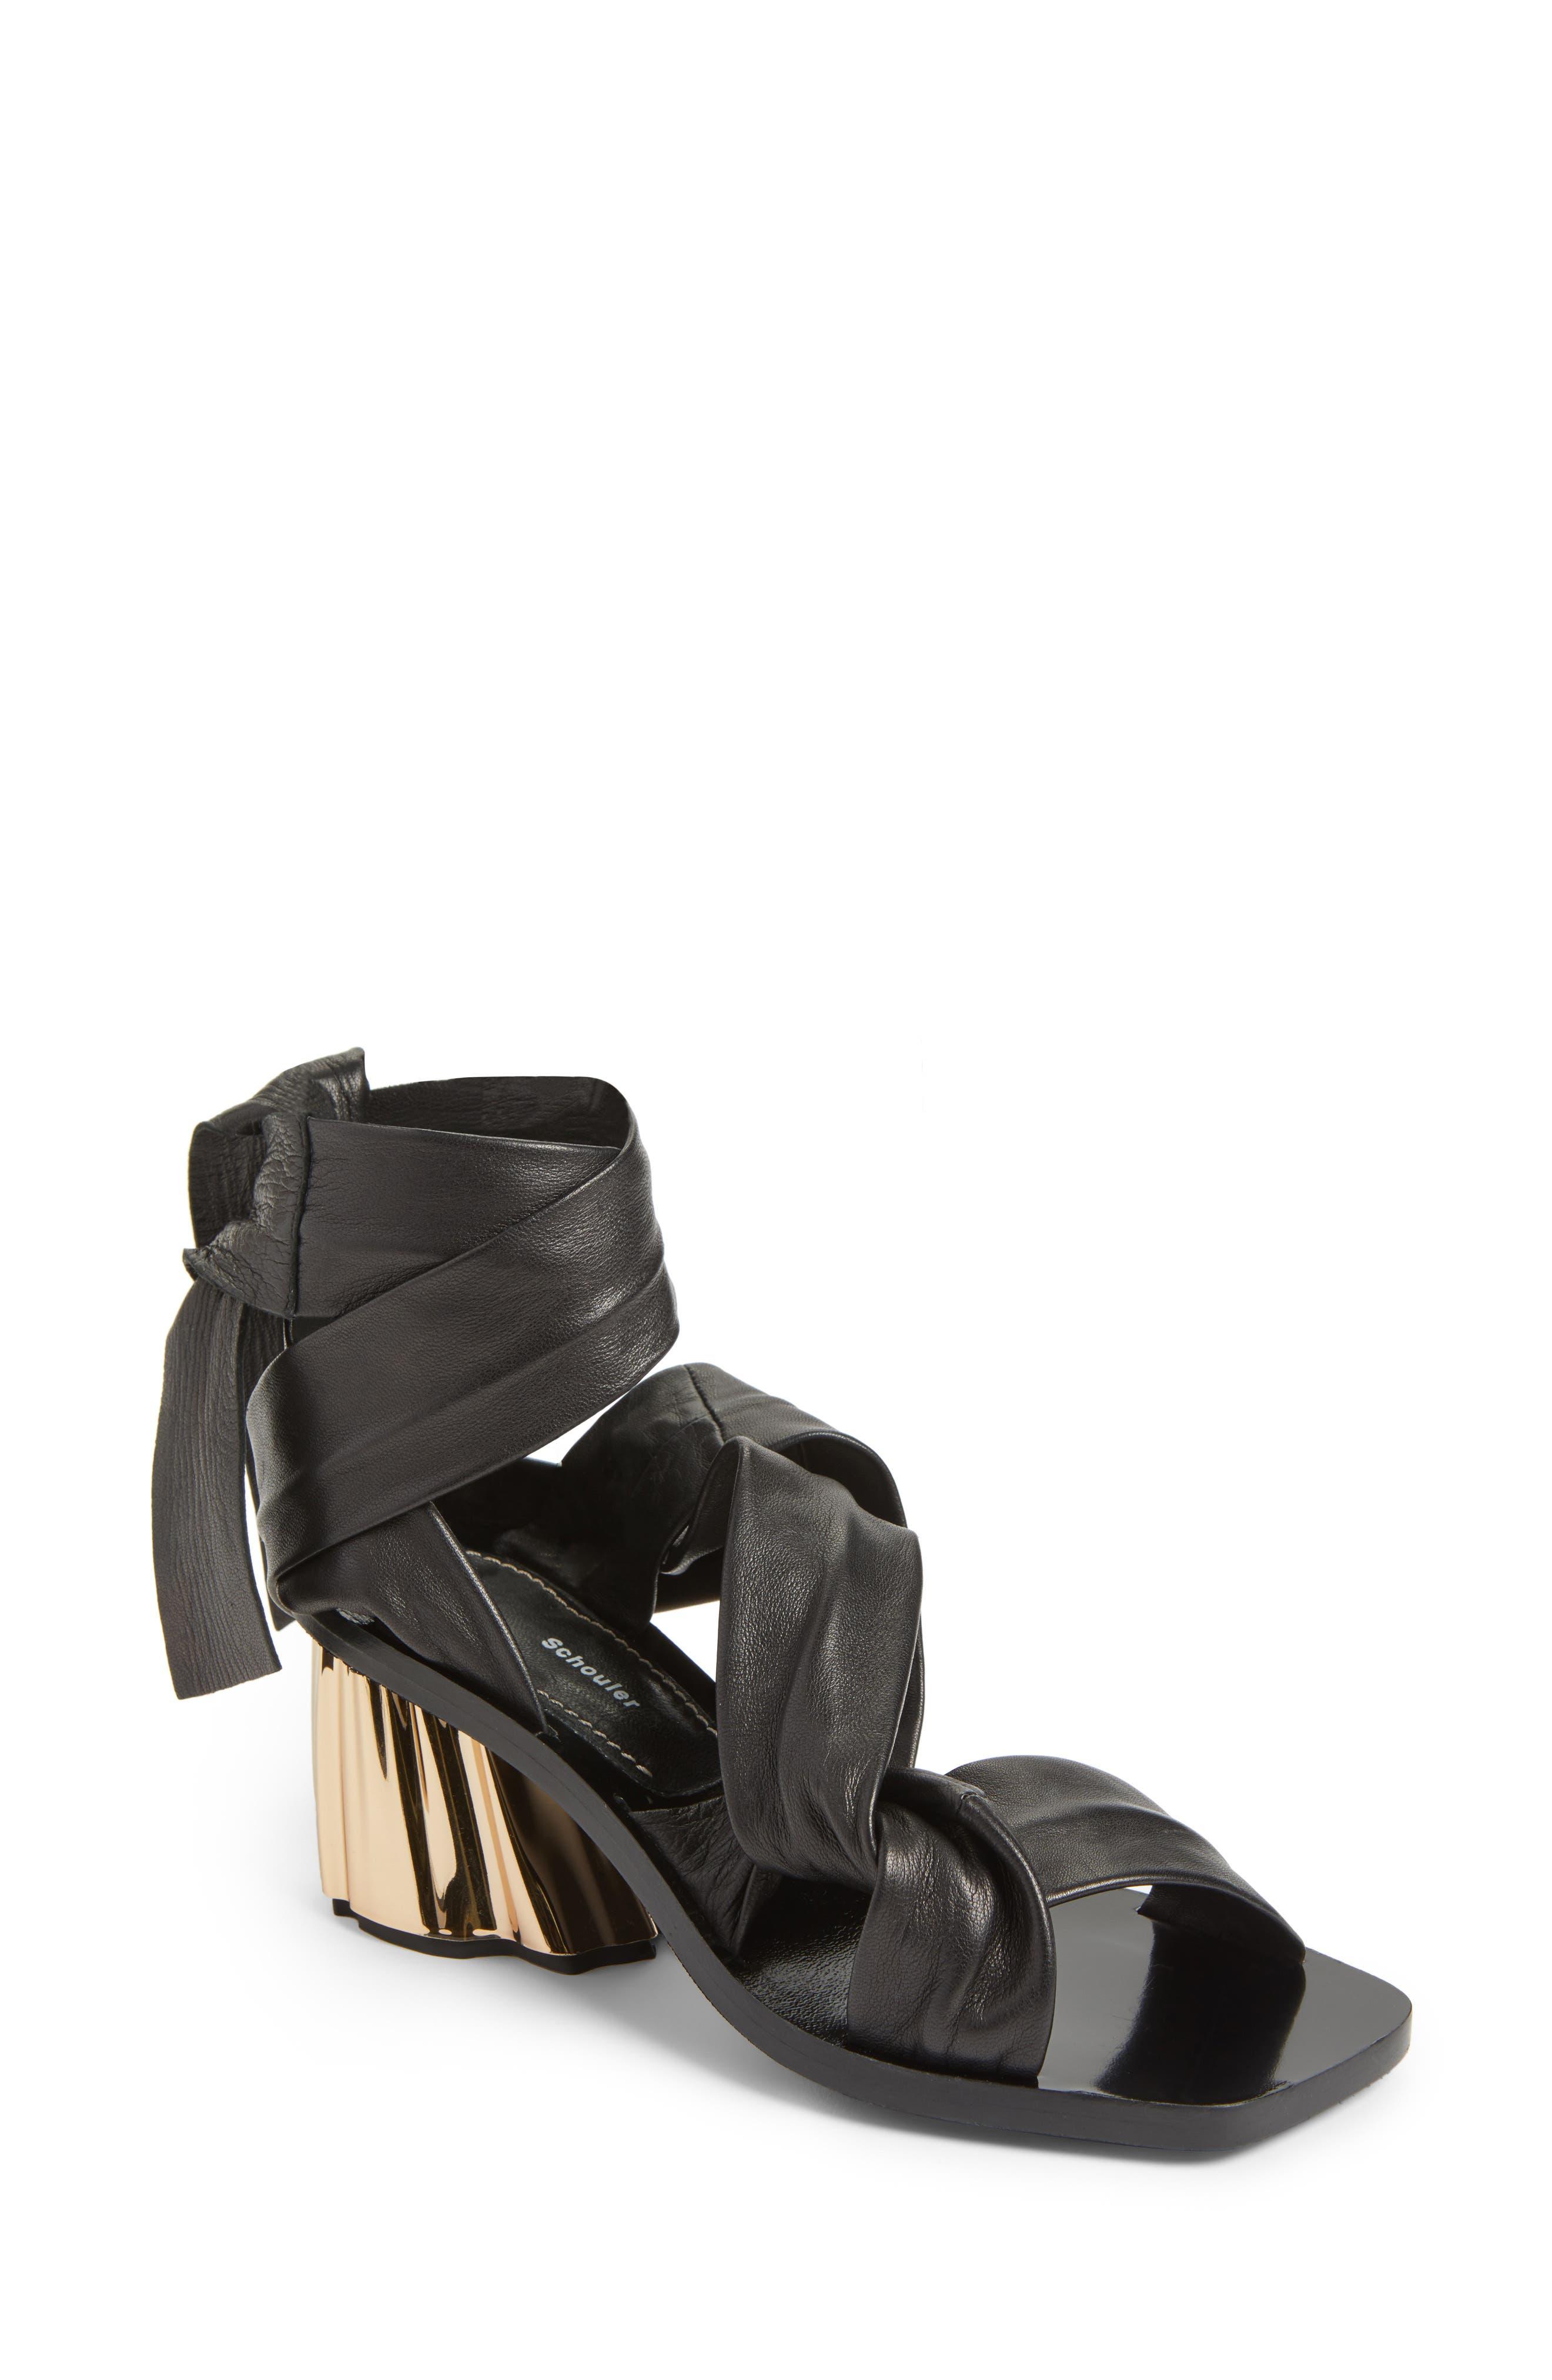 Proenza Schouler Ankle Wrap Sandal (Women)